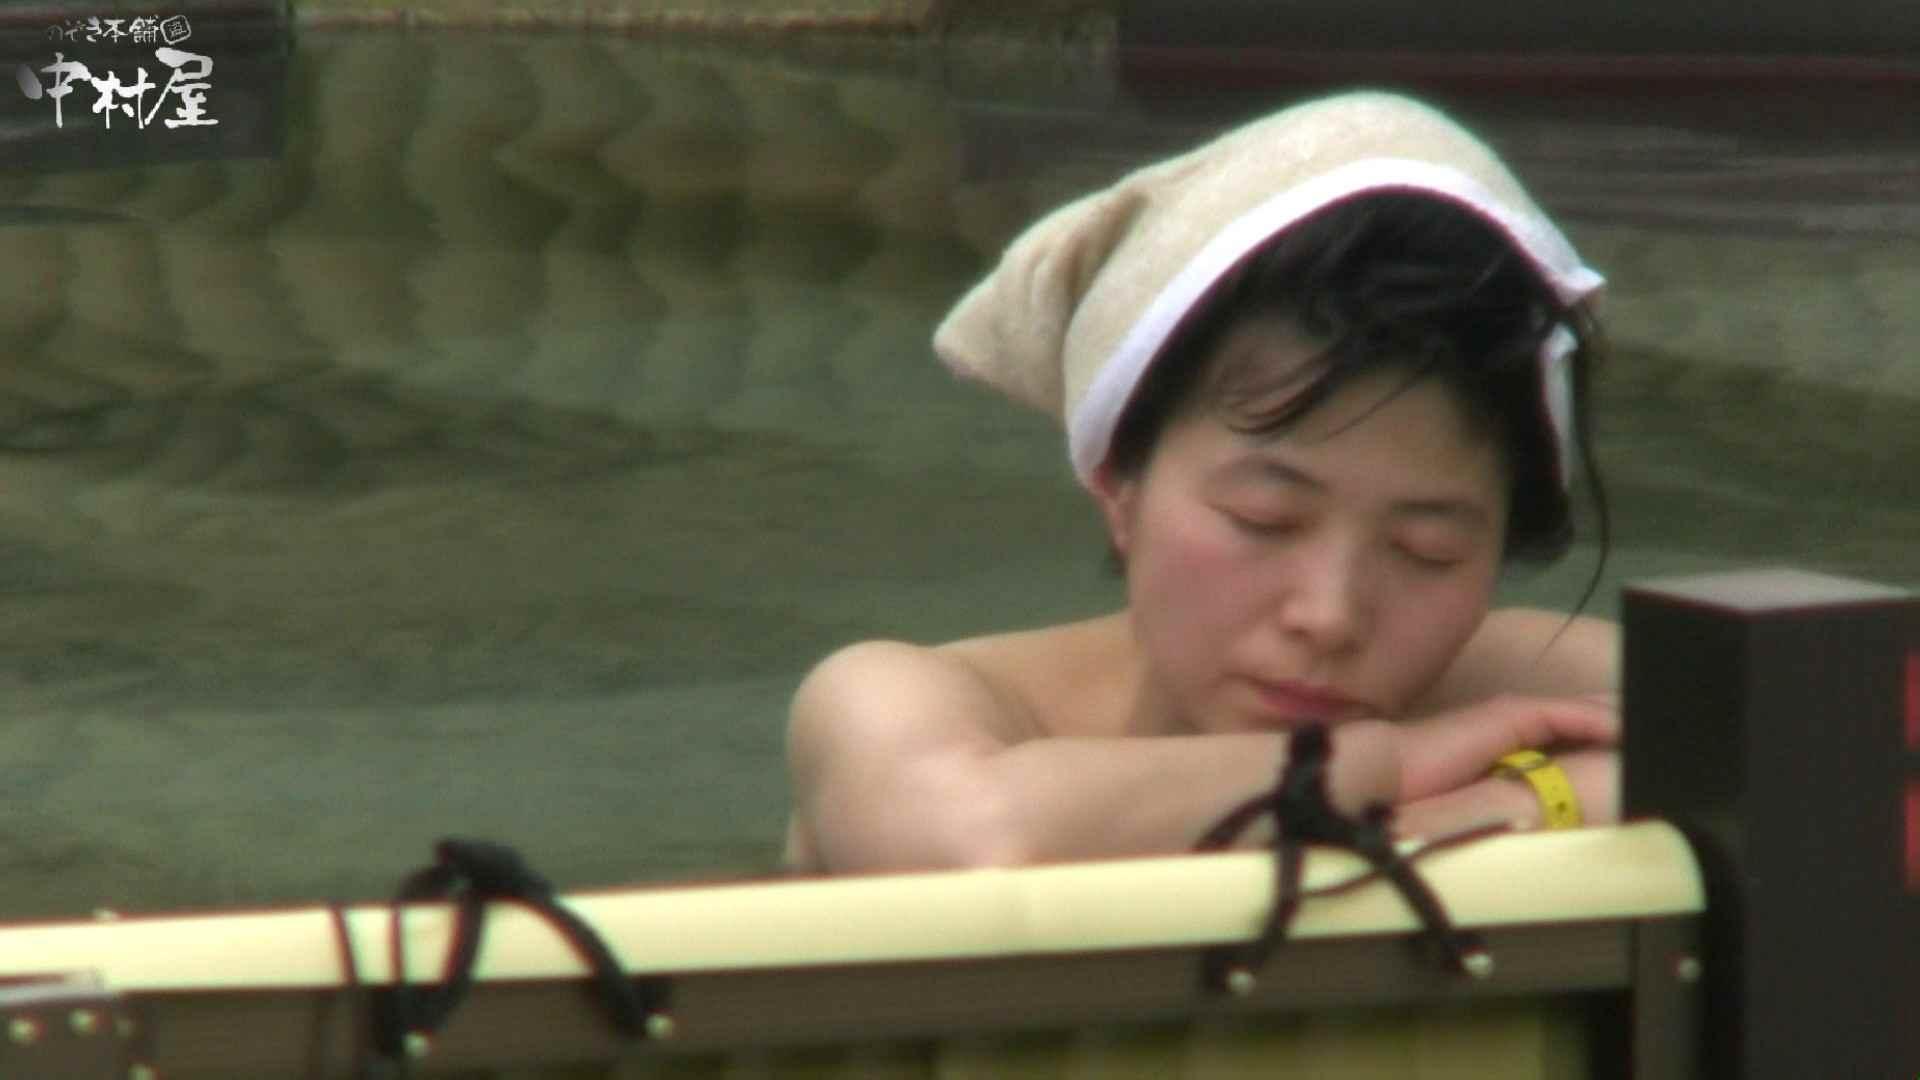 Aquaな露天風呂Vol.950 美しいOLの裸体 | 露天風呂突入  75pic 7